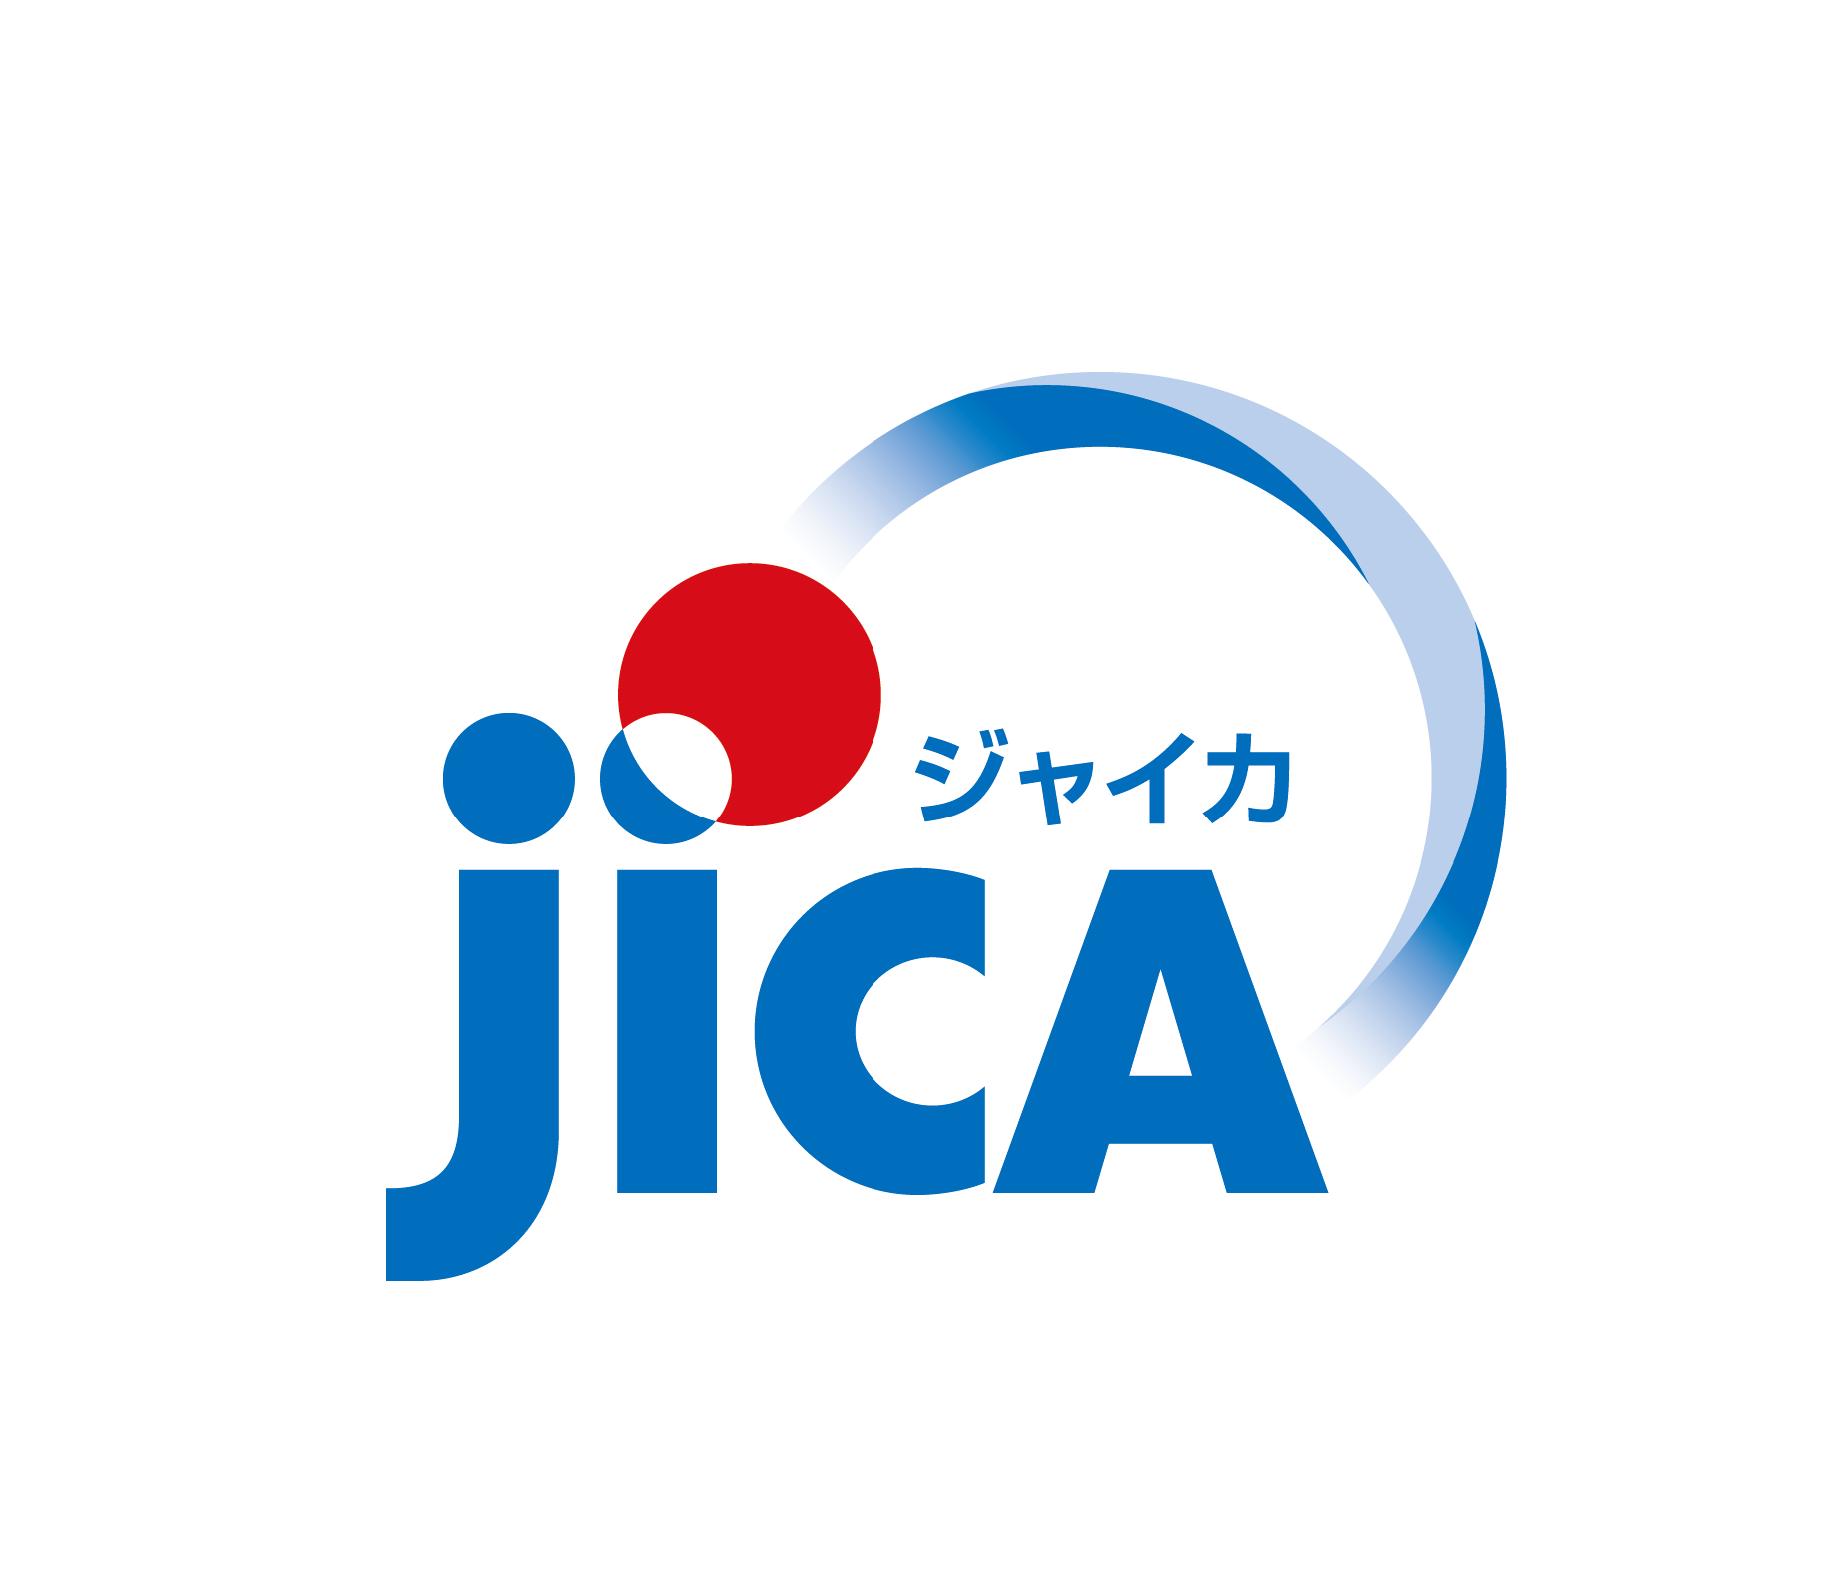 JICA 中小企業・SDGsビジネス支援事業